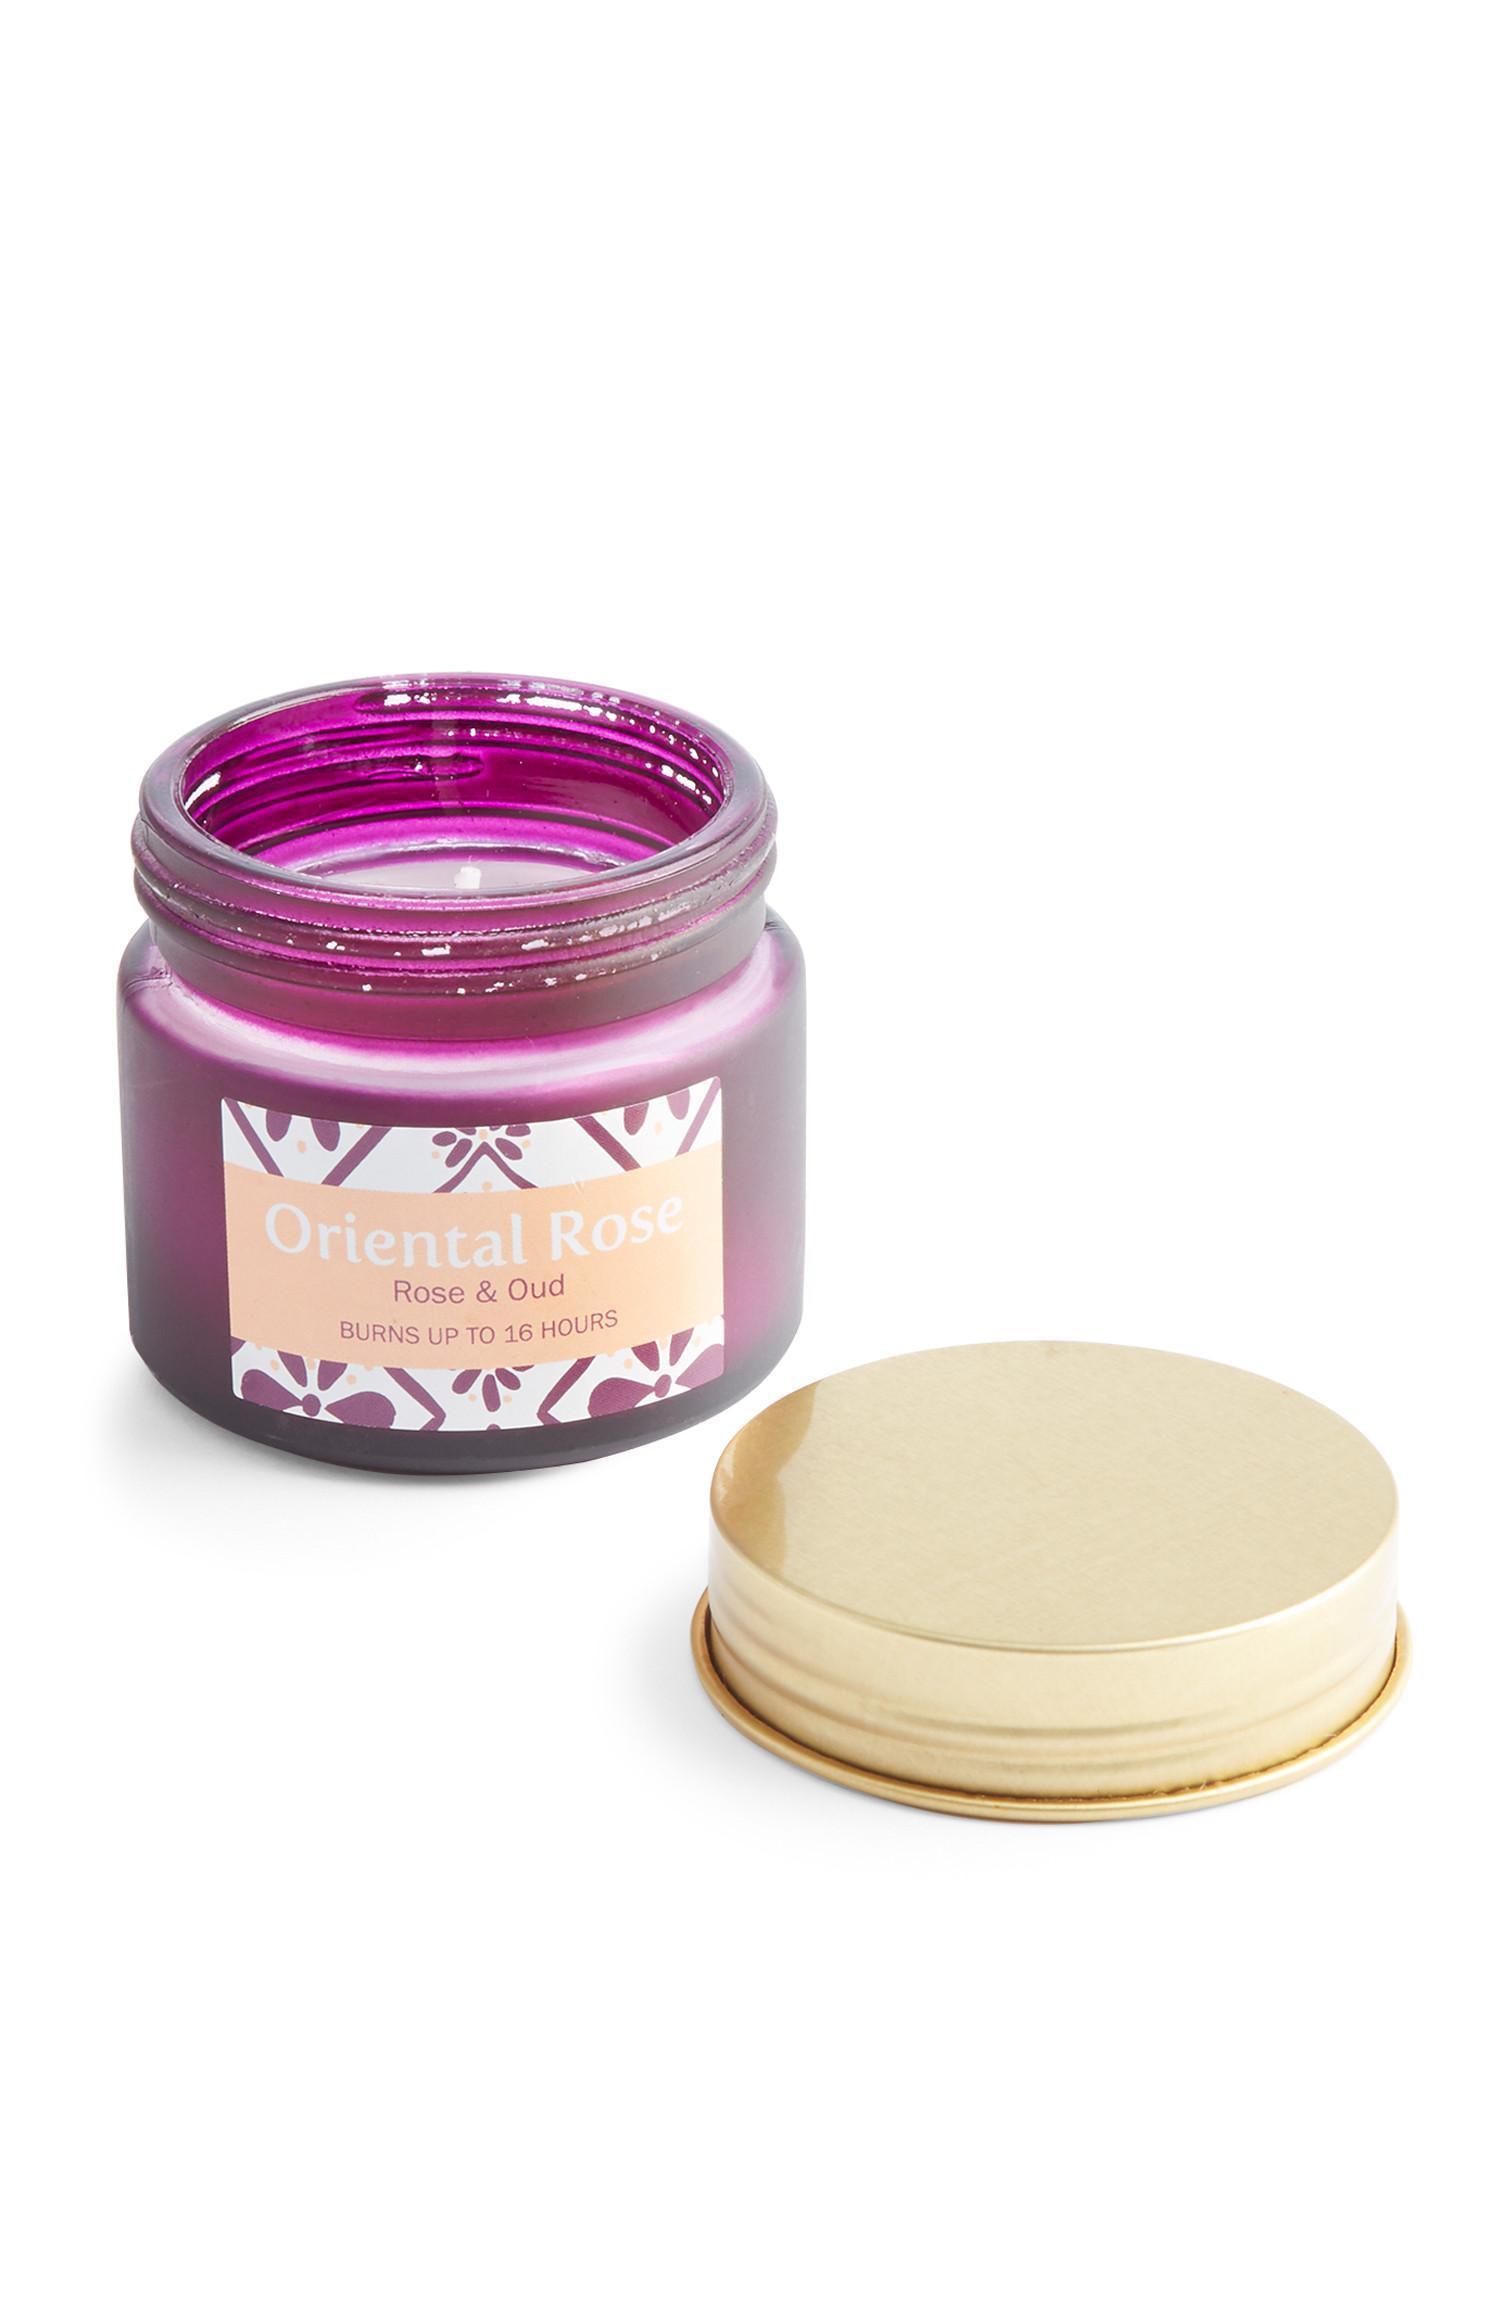 Violette Mini-Kerze im Glas